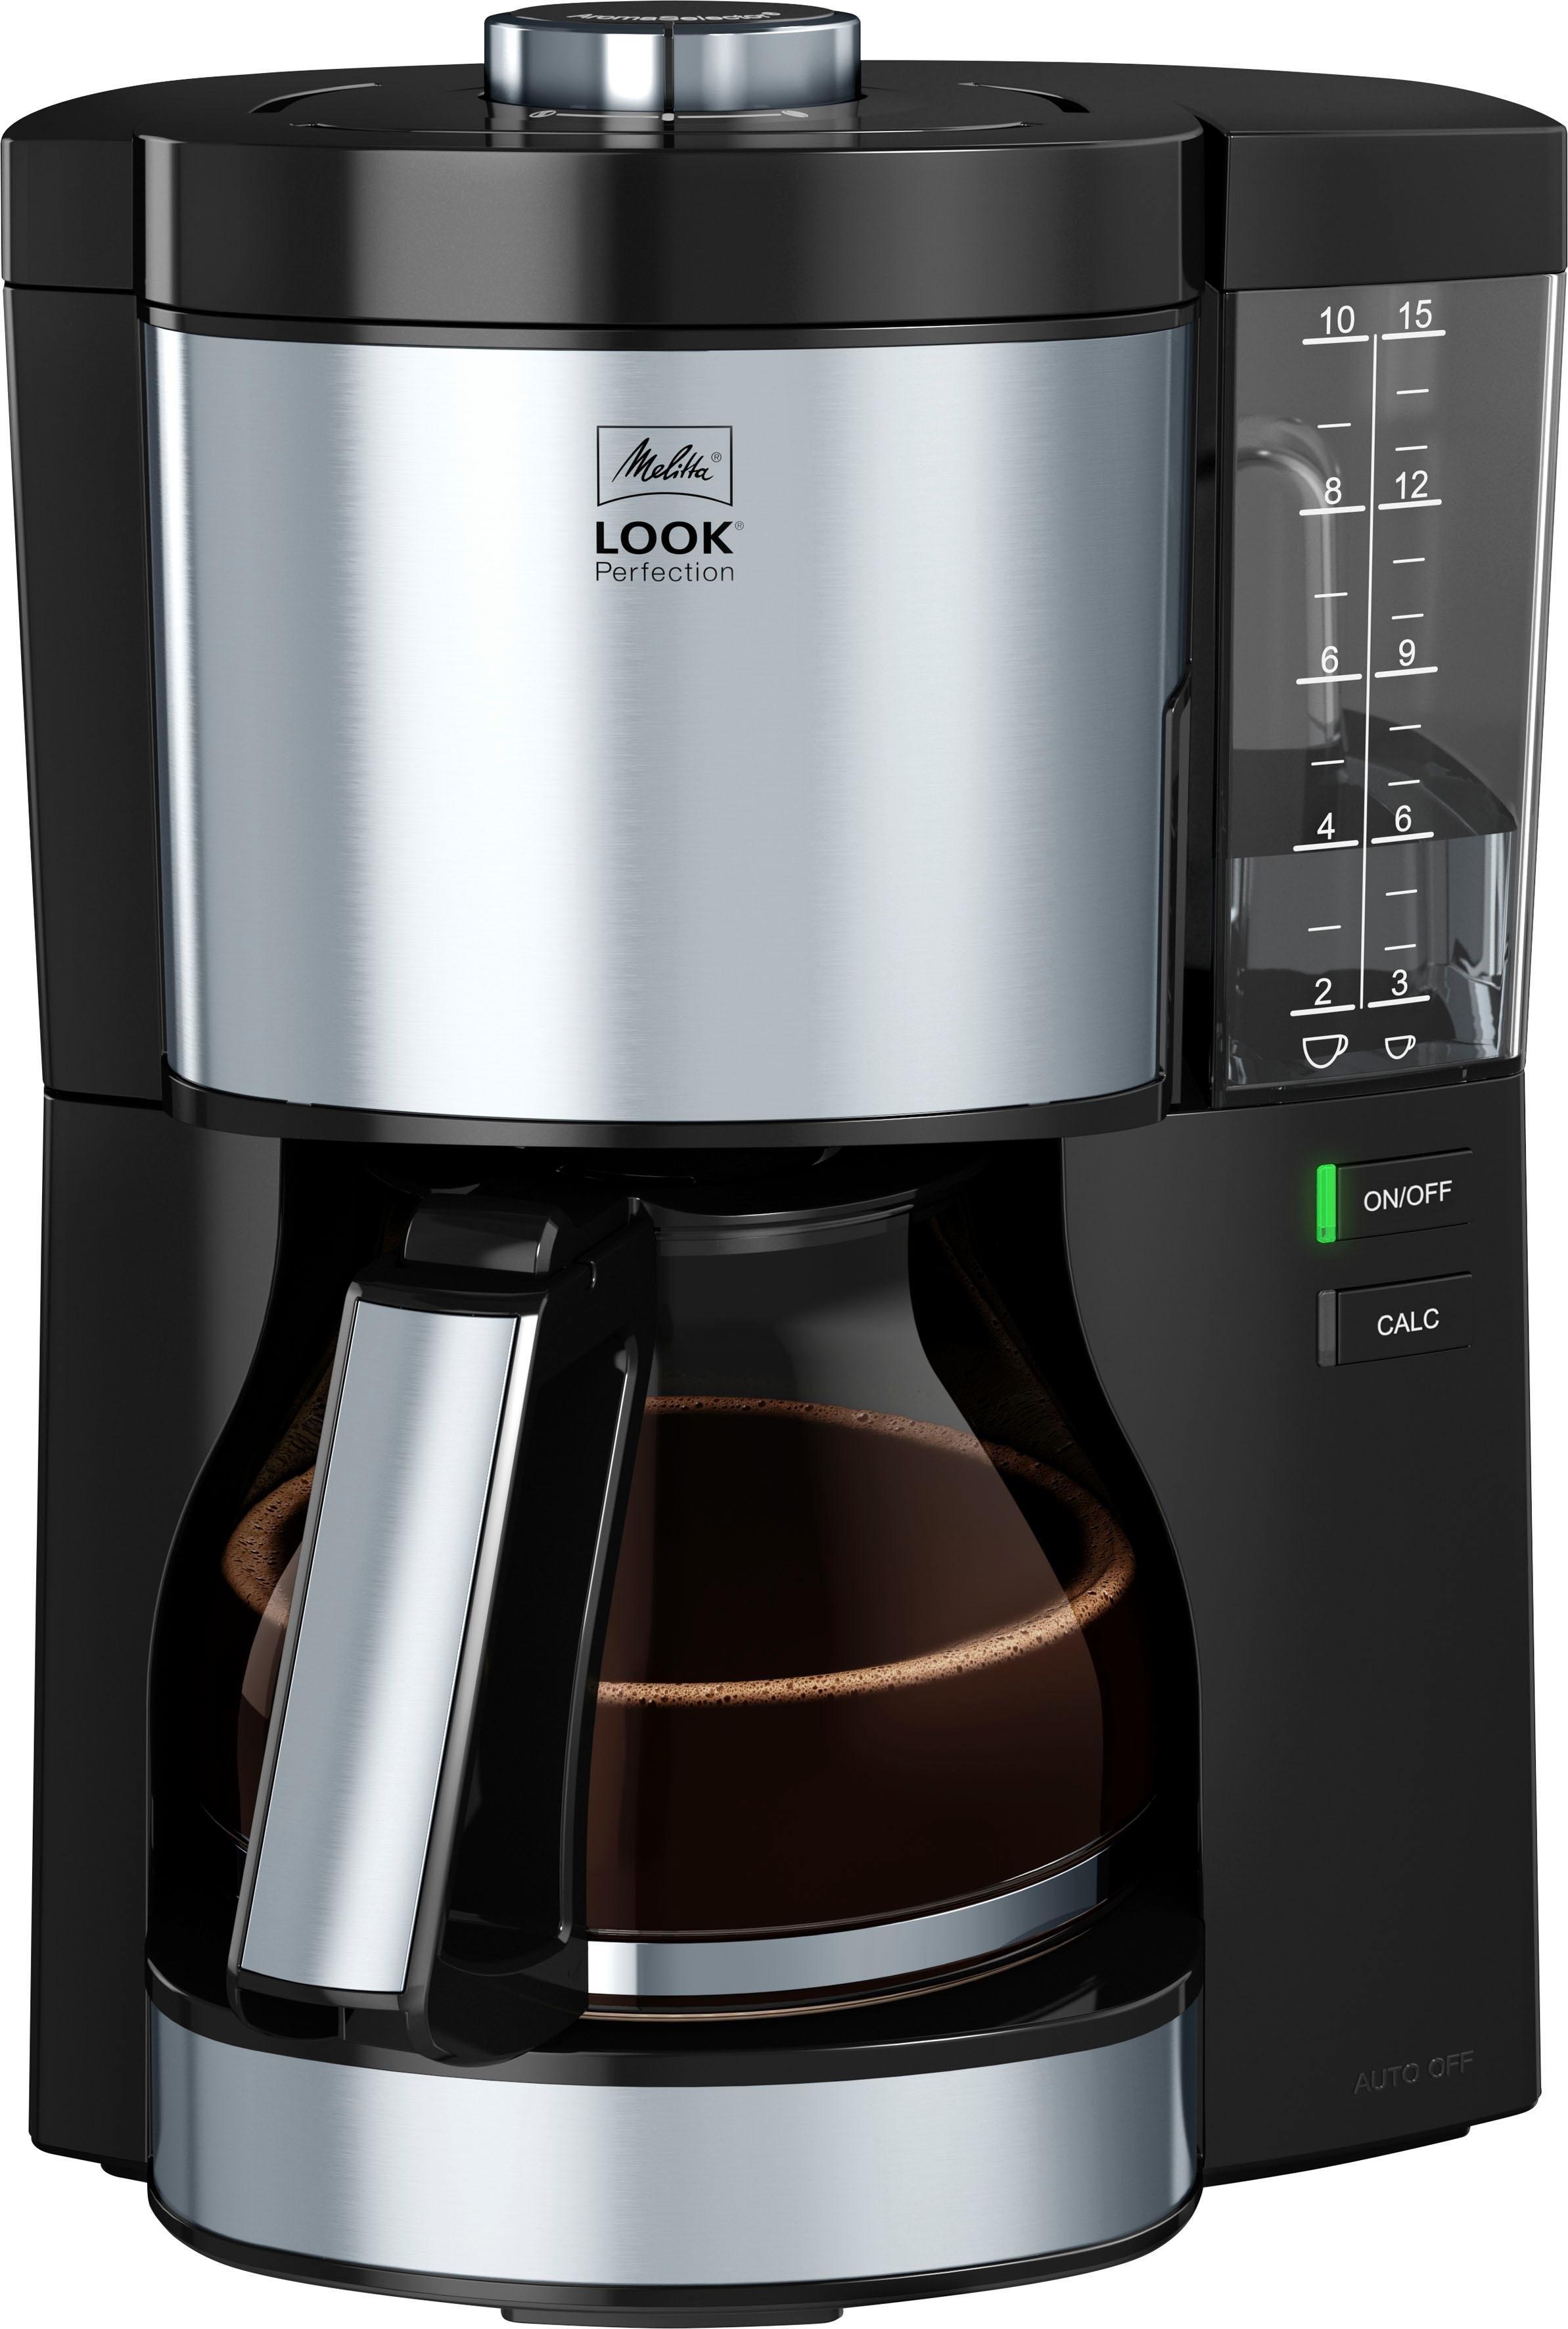 Melitta filterkoffieapparaat Look V Perfection 1025-06 zwart, 1,25 l nu online bestellen